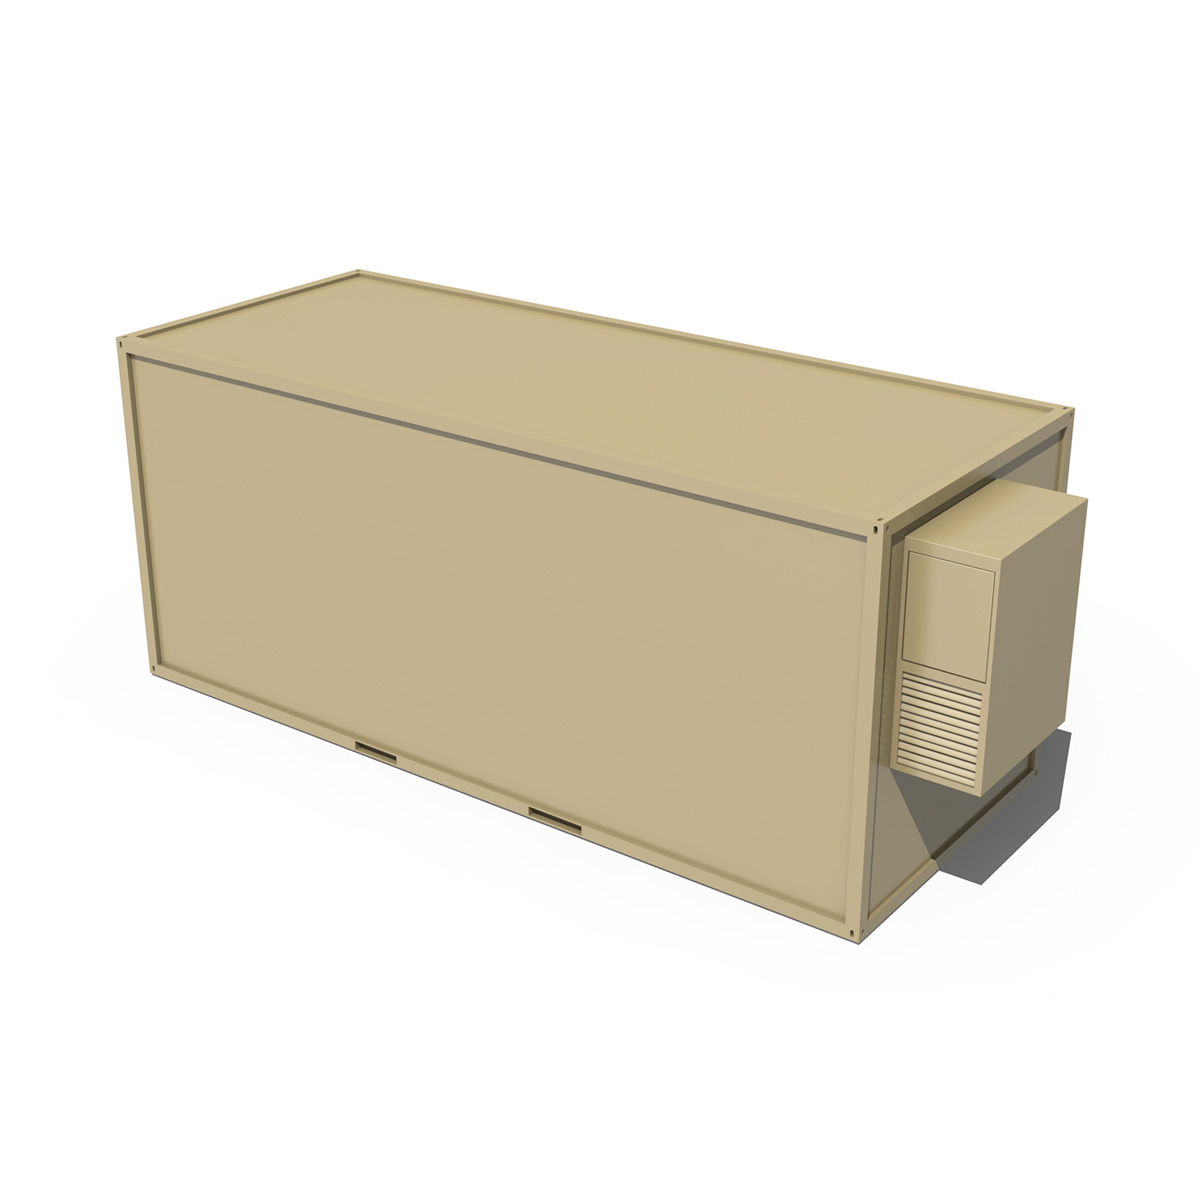 20ft ofis konteyner versiyası iki 3d model 3ds fbx c4d lwo obj 252275